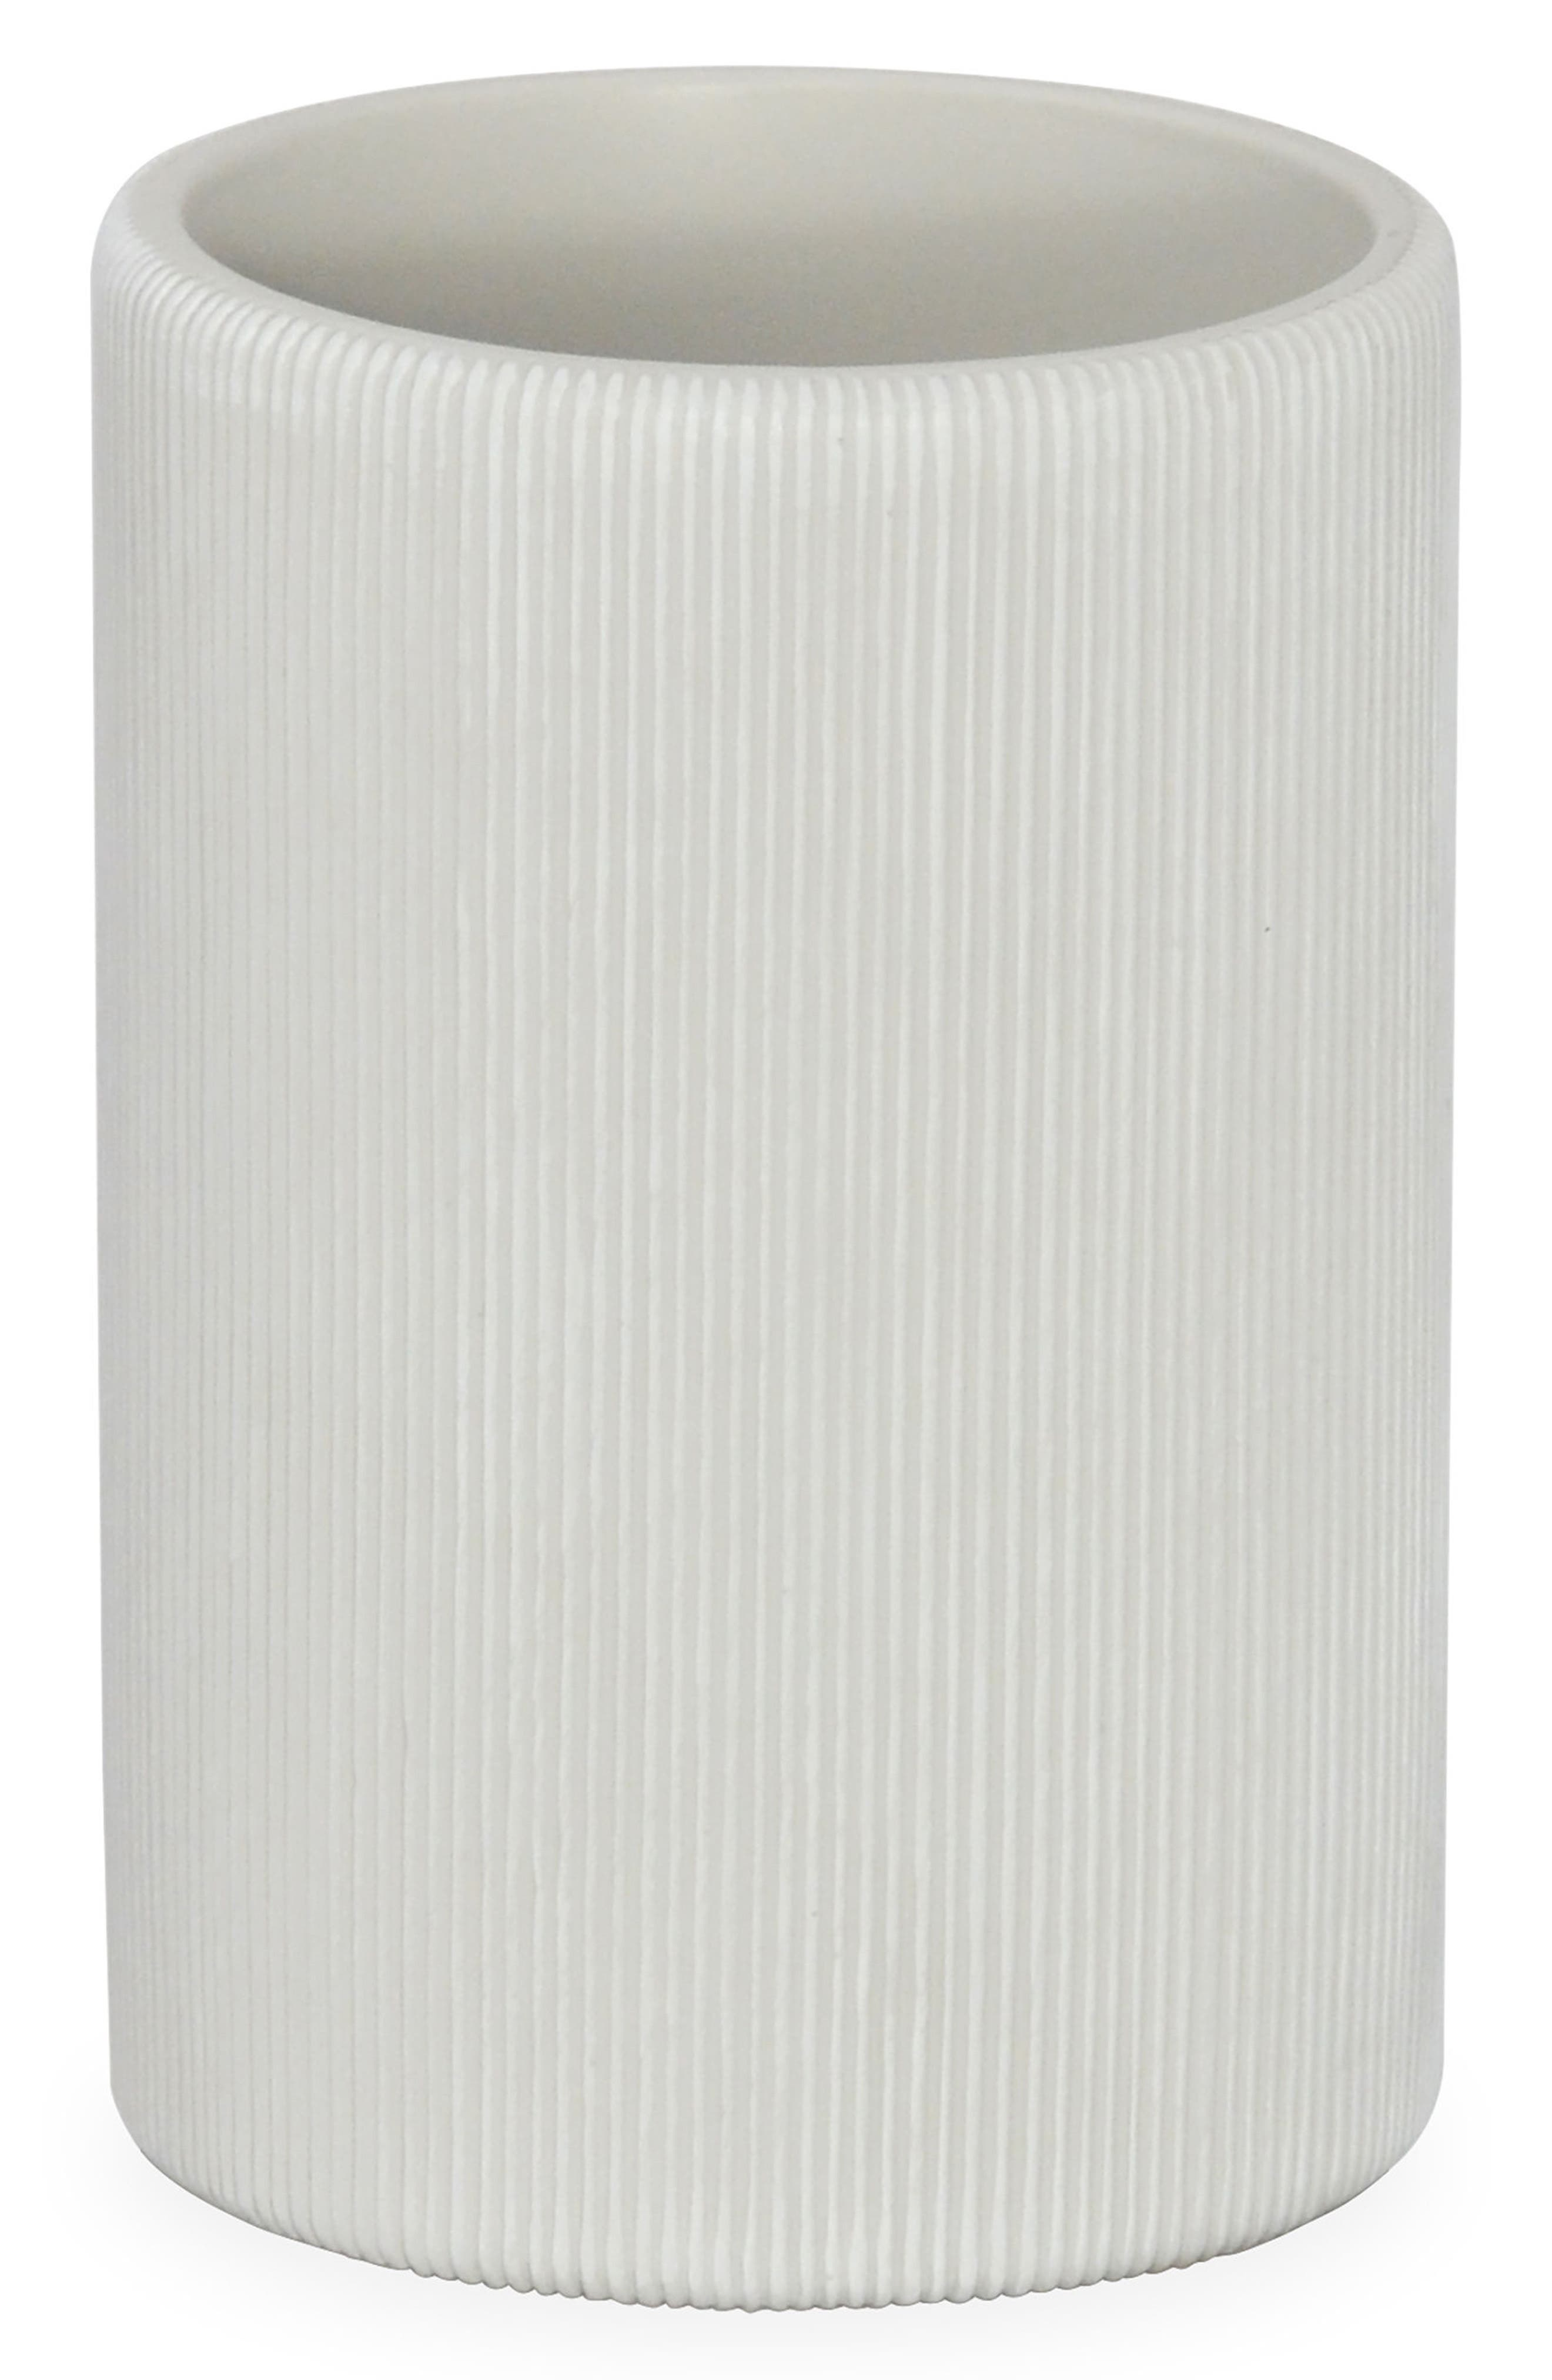 DKNY Fine Lines Ceramic Tumbler, Main, color, WHITE